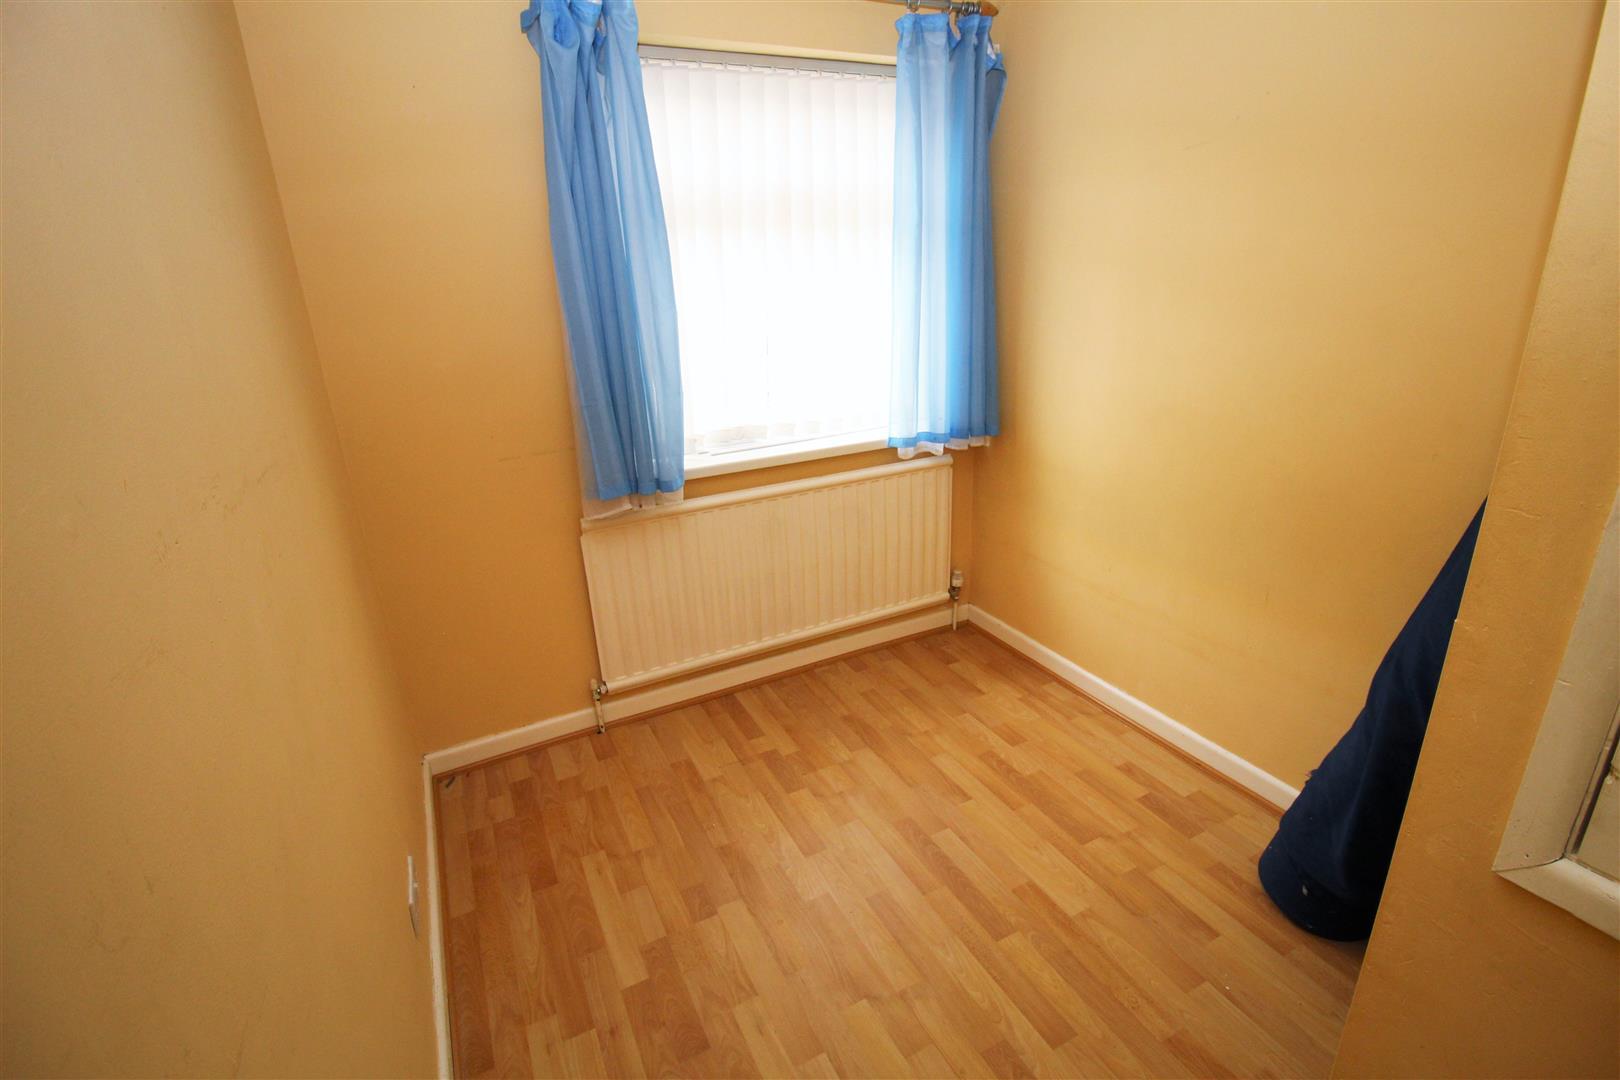 4 Bedrooms, House - Detached, Lytham Close, Liverpool